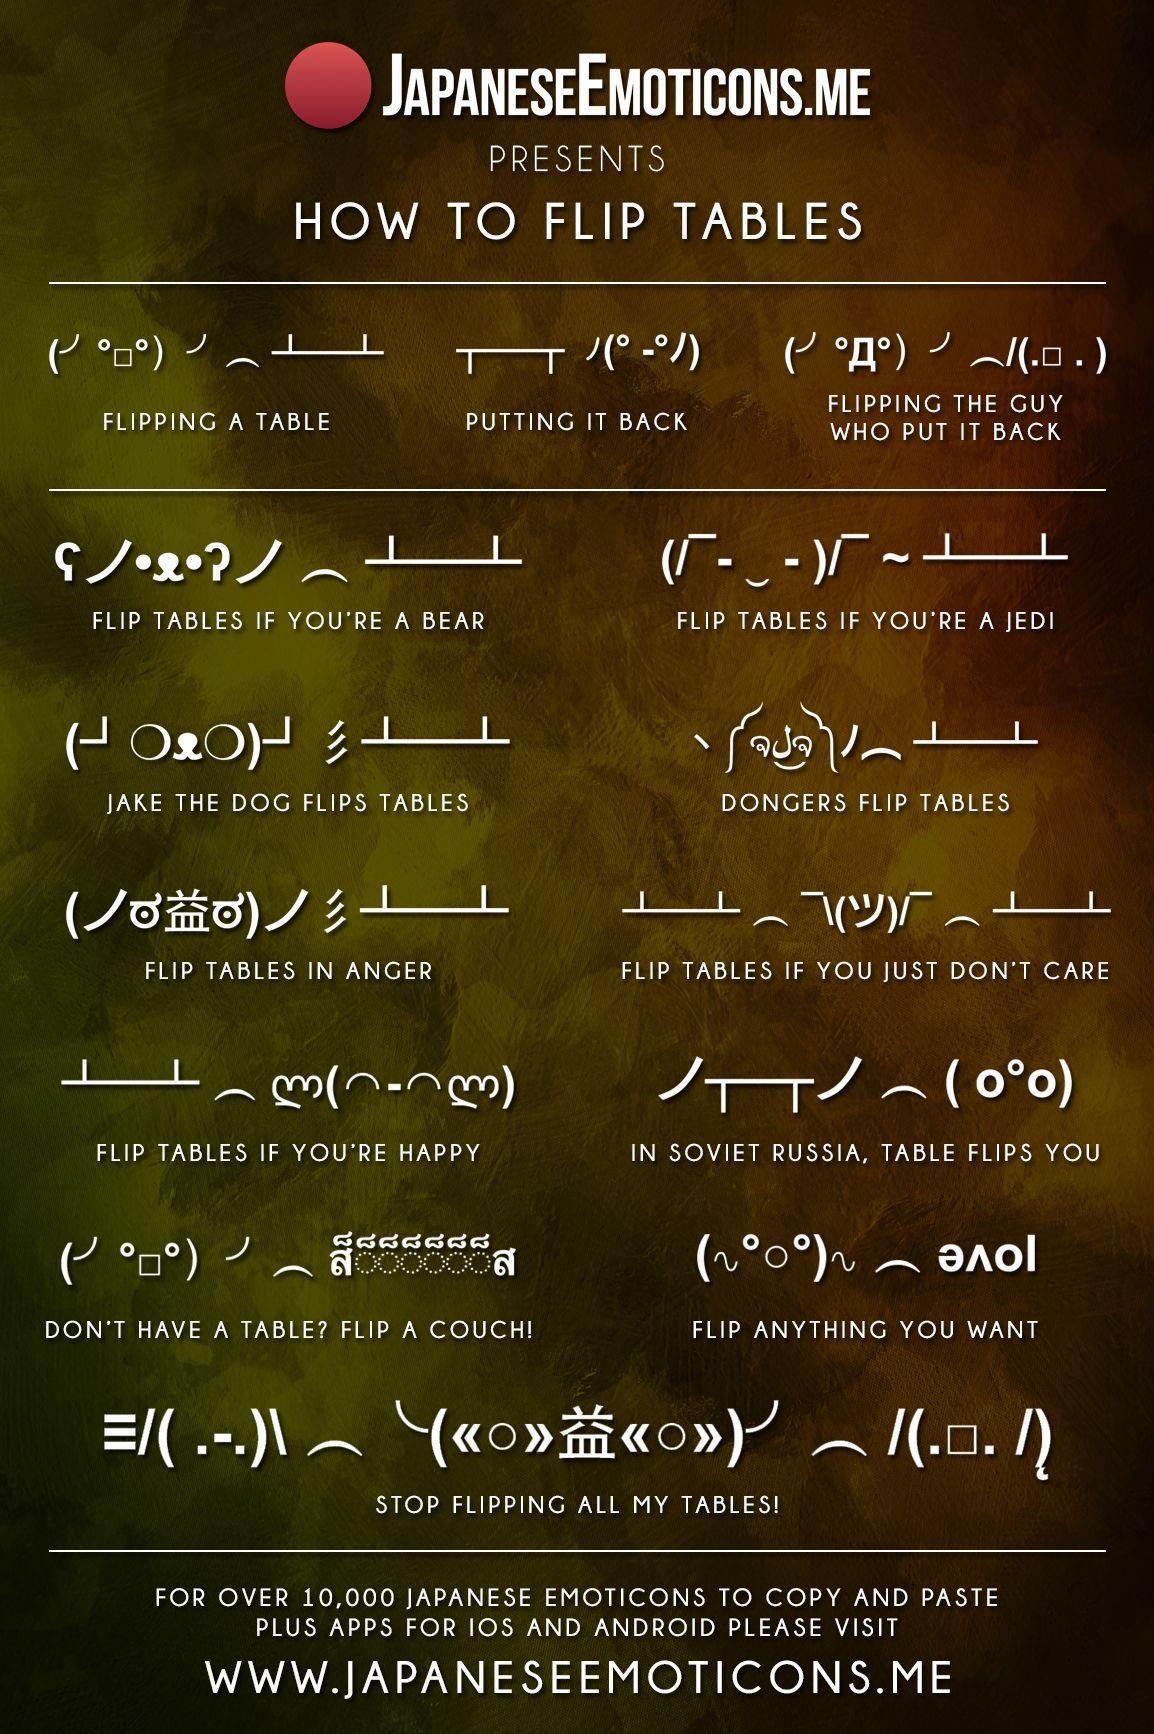 Japaneseemoticons Me Kaomoji Emoji Dongers ᶘ ᵒᴥᵒᶅ Silly Words Table Flip Science Decor